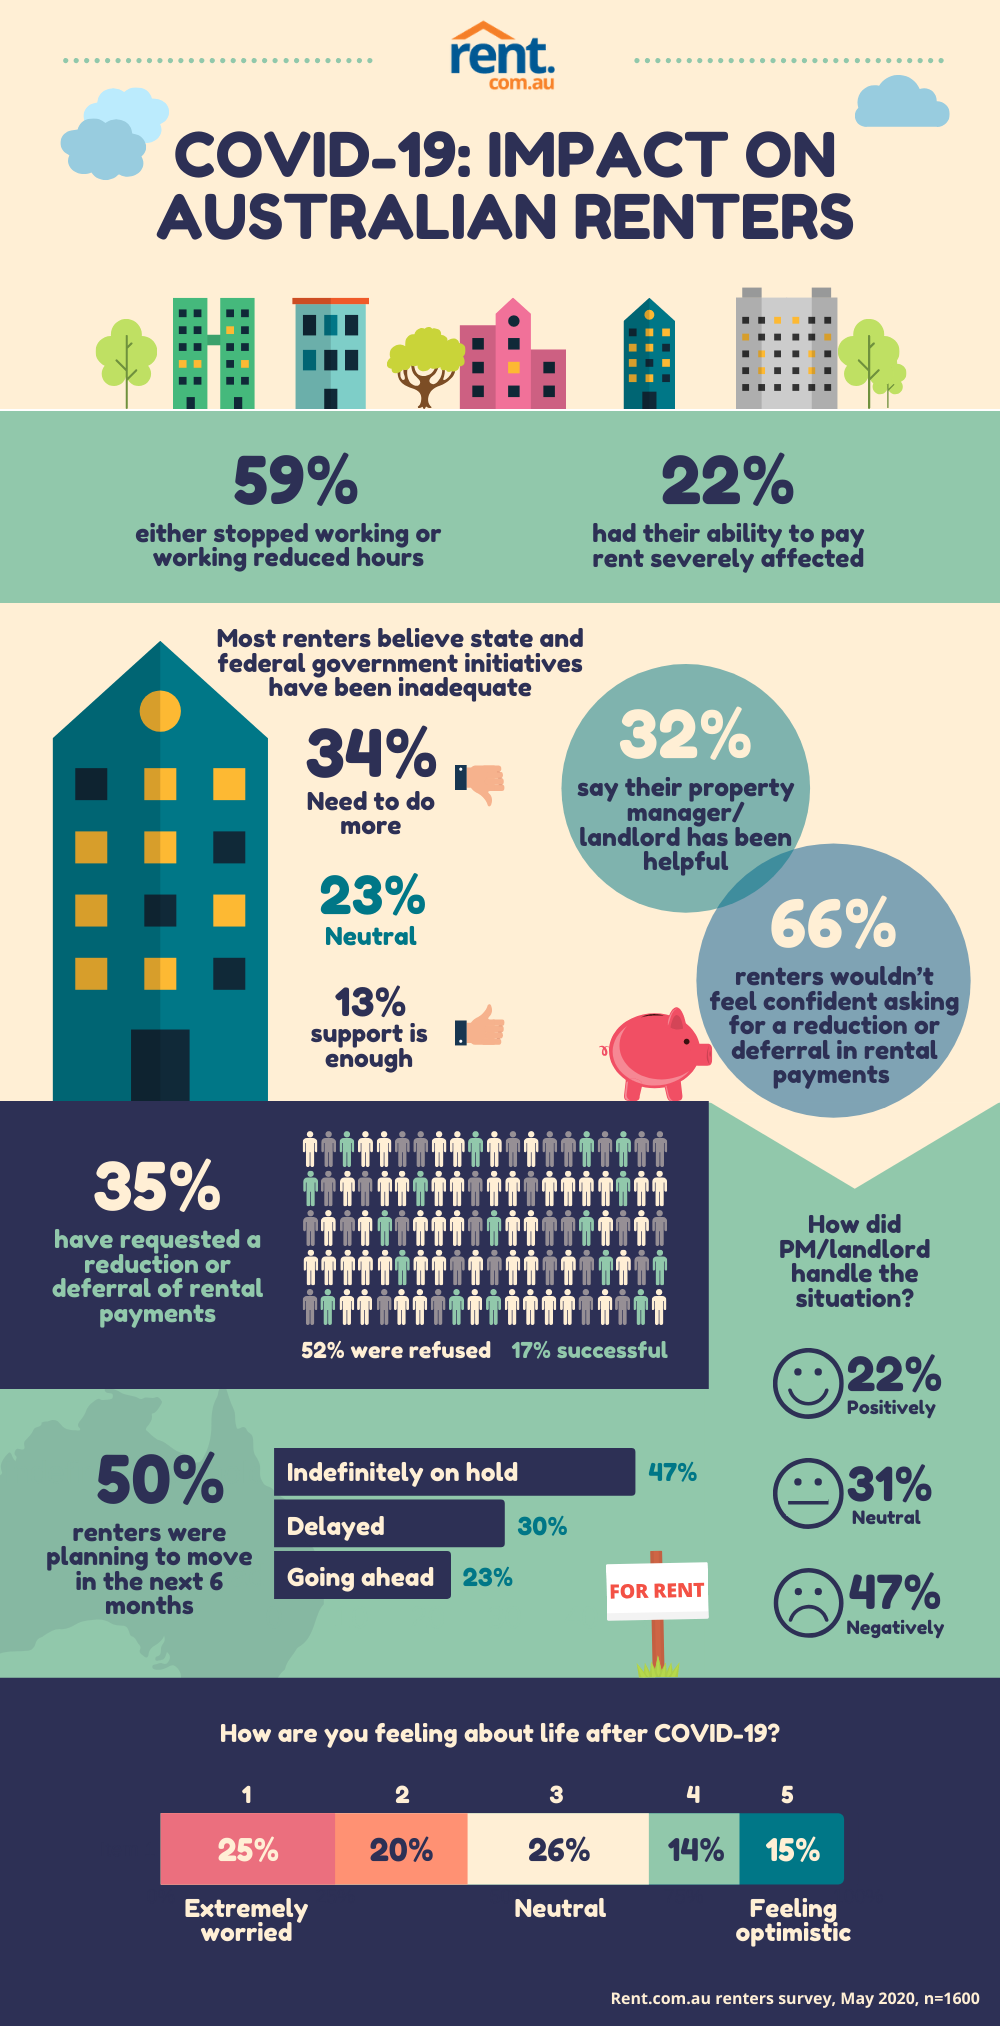 Covid 19 Impact On Australian Renters